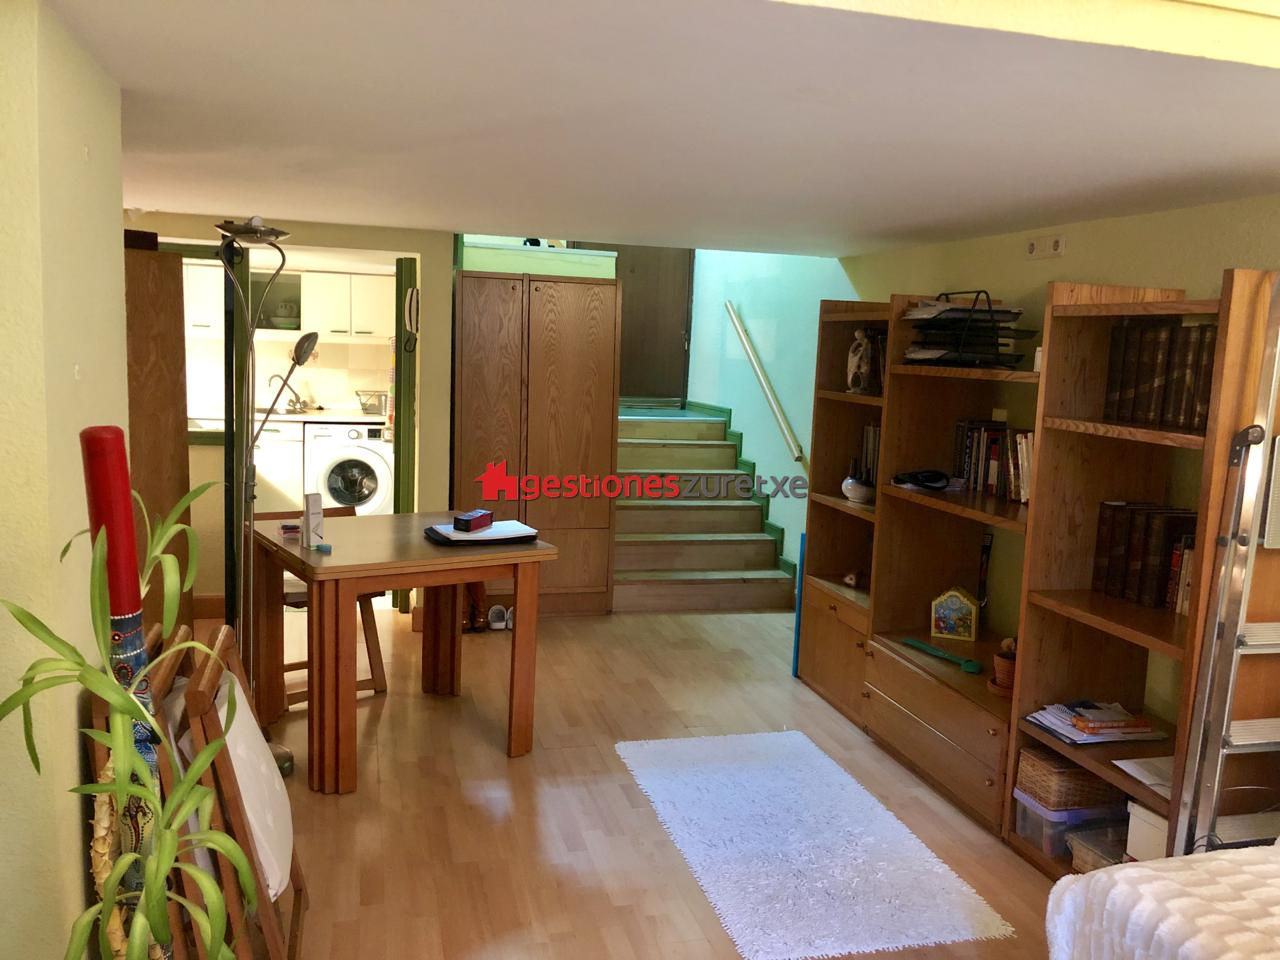 af38f1f559bcb Gestiones Zuretxe tu 1ª Inmobiliaria en Bilbao y Home Staging